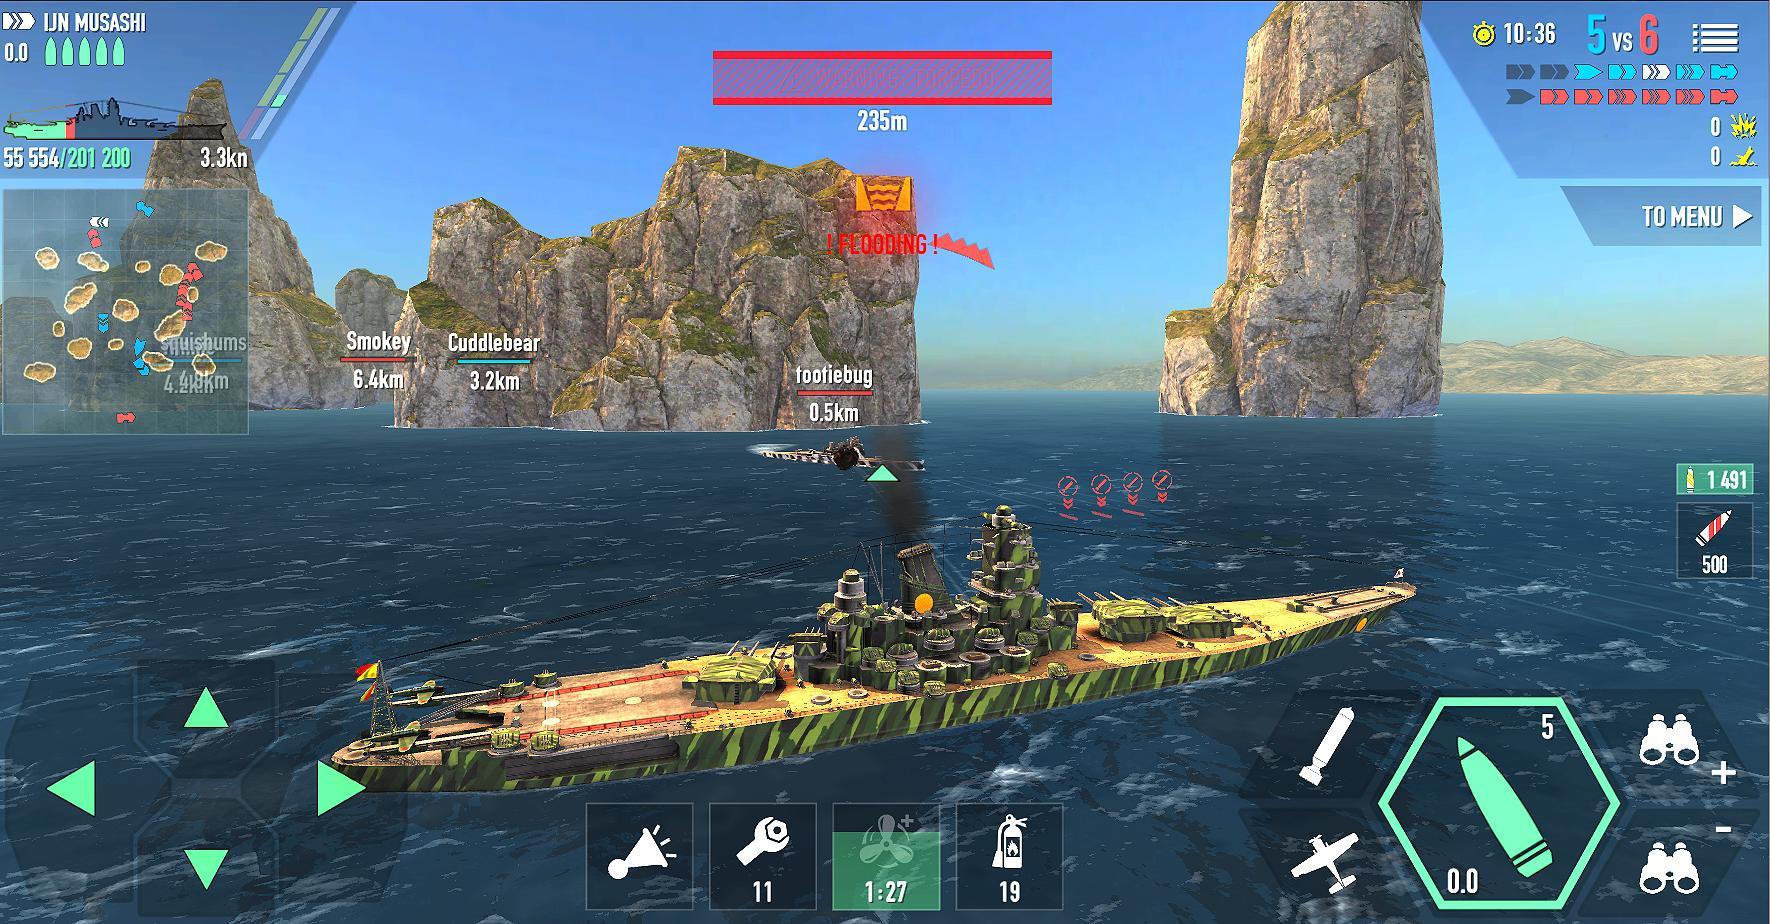 battle of warships naval blitz mod apk download